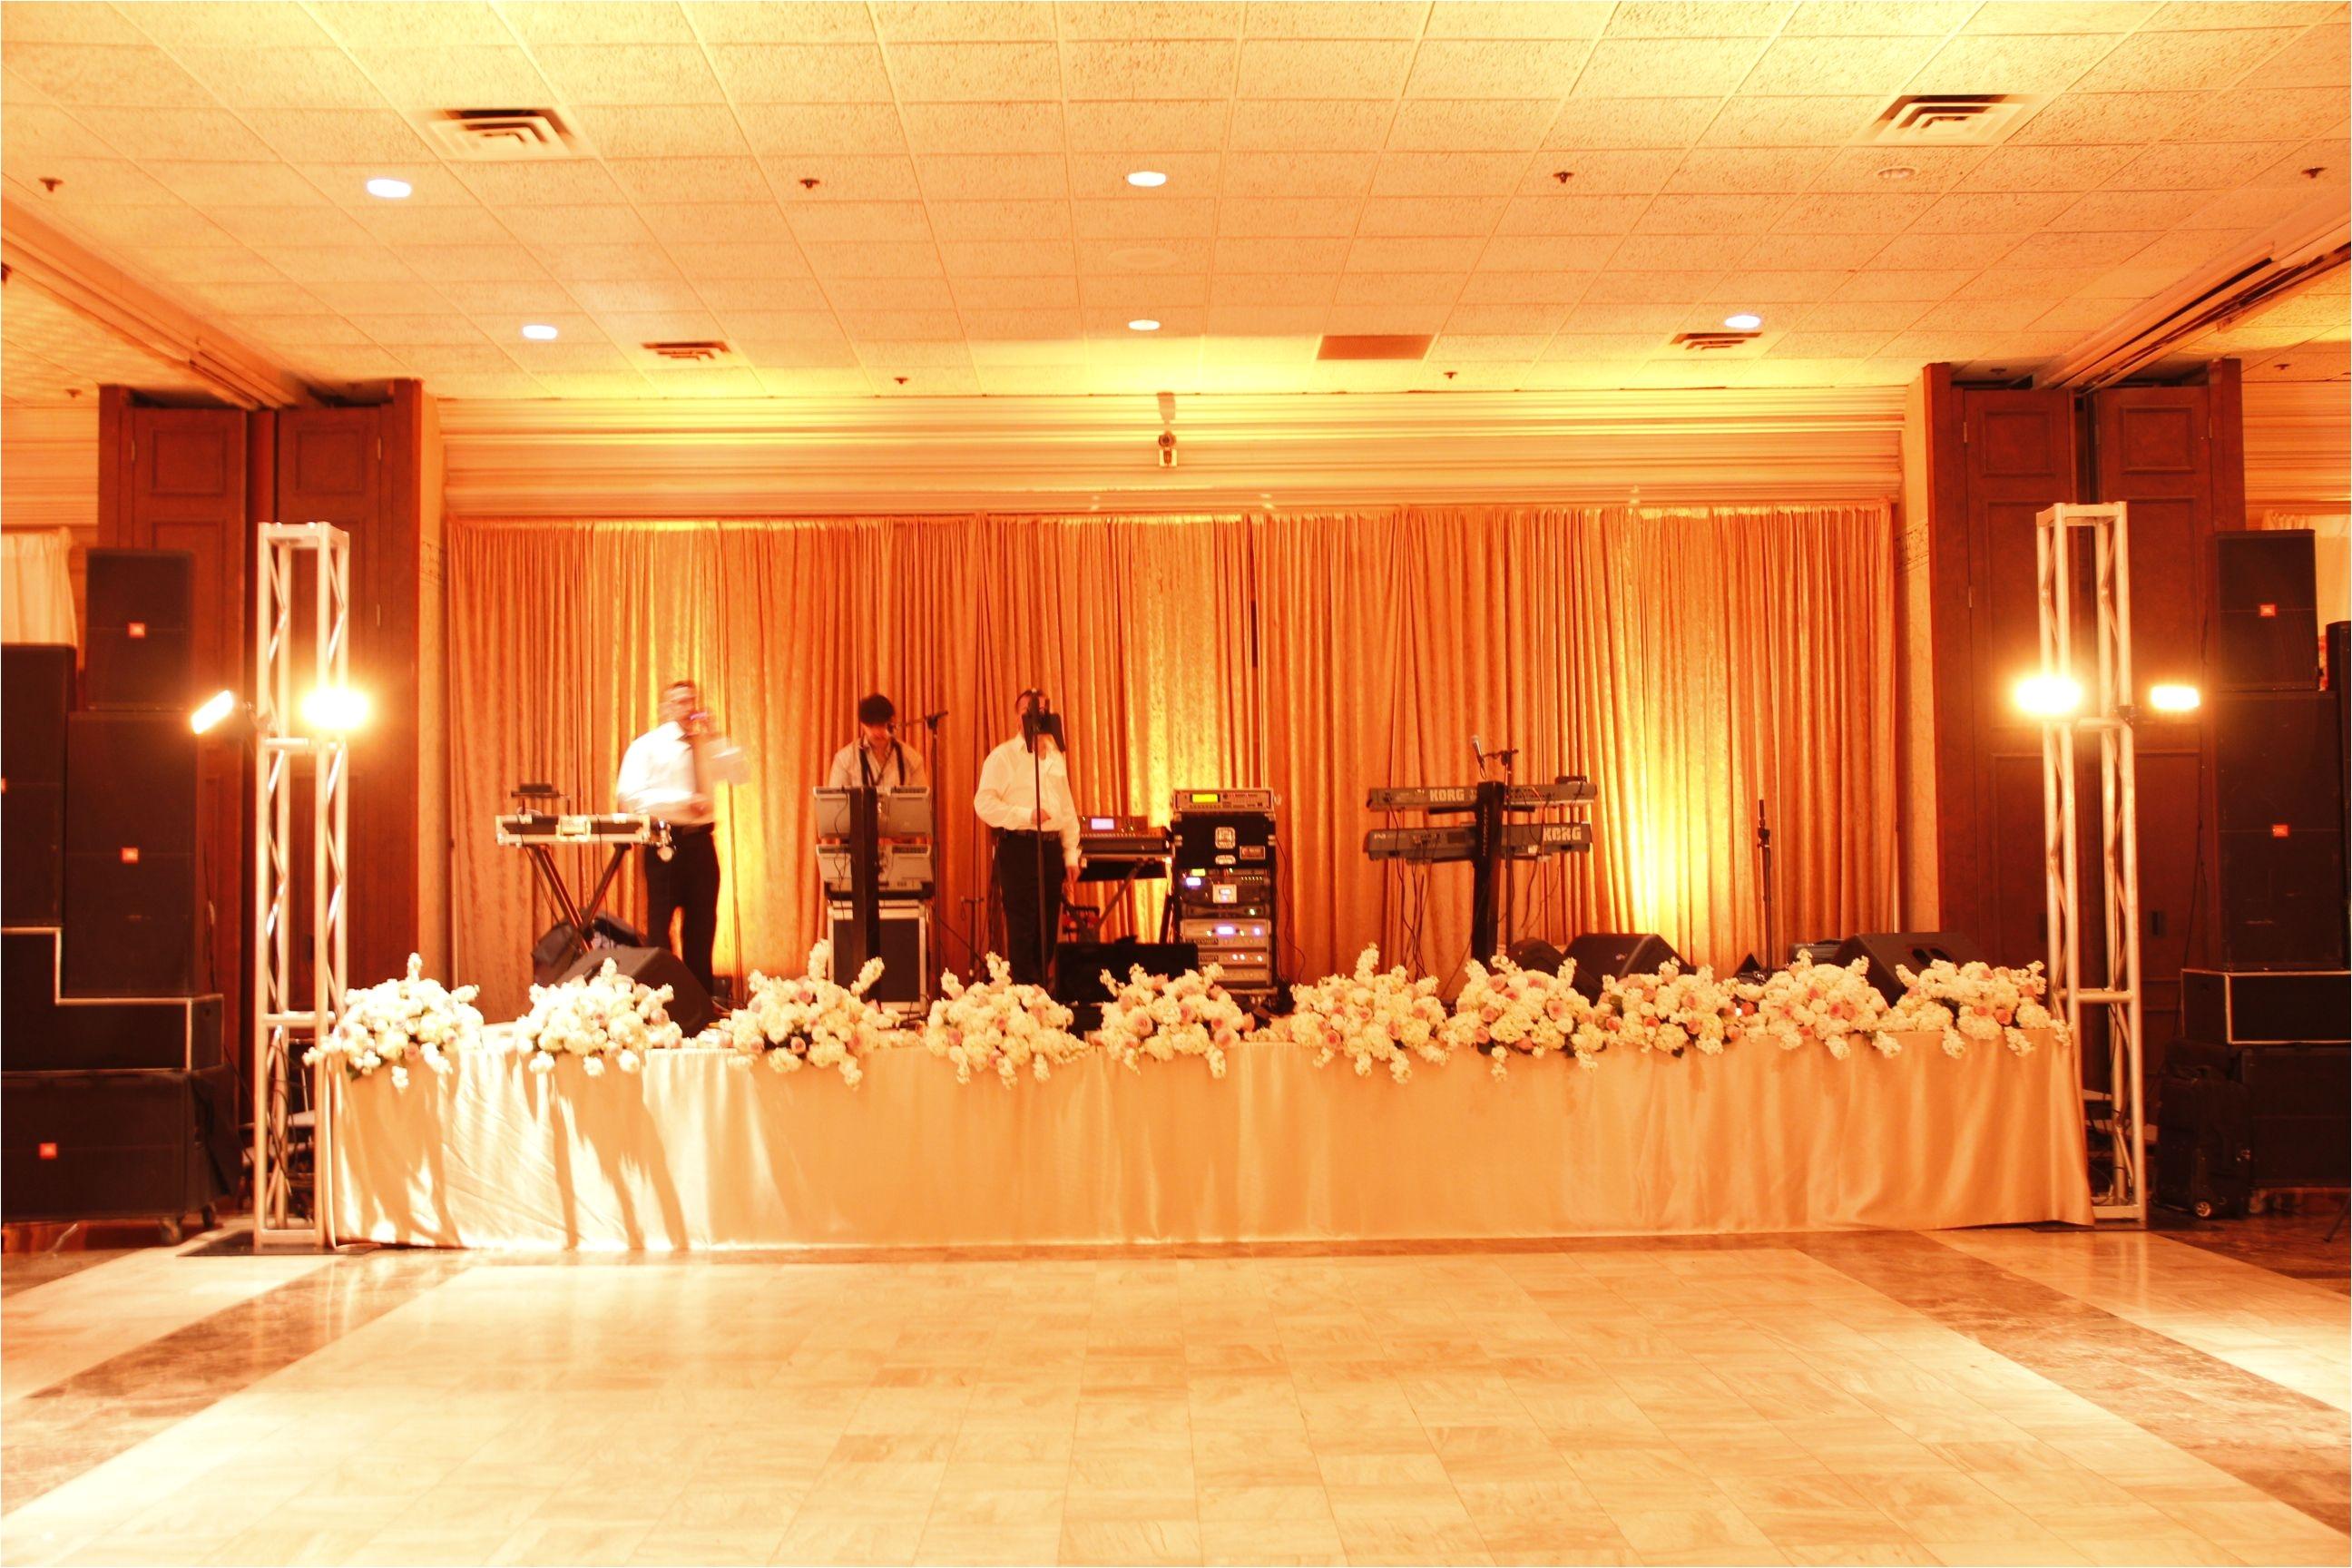 Up Lighting for Weddings Led Uplighting Mercury sound Lighting Www Mercurysl Com event